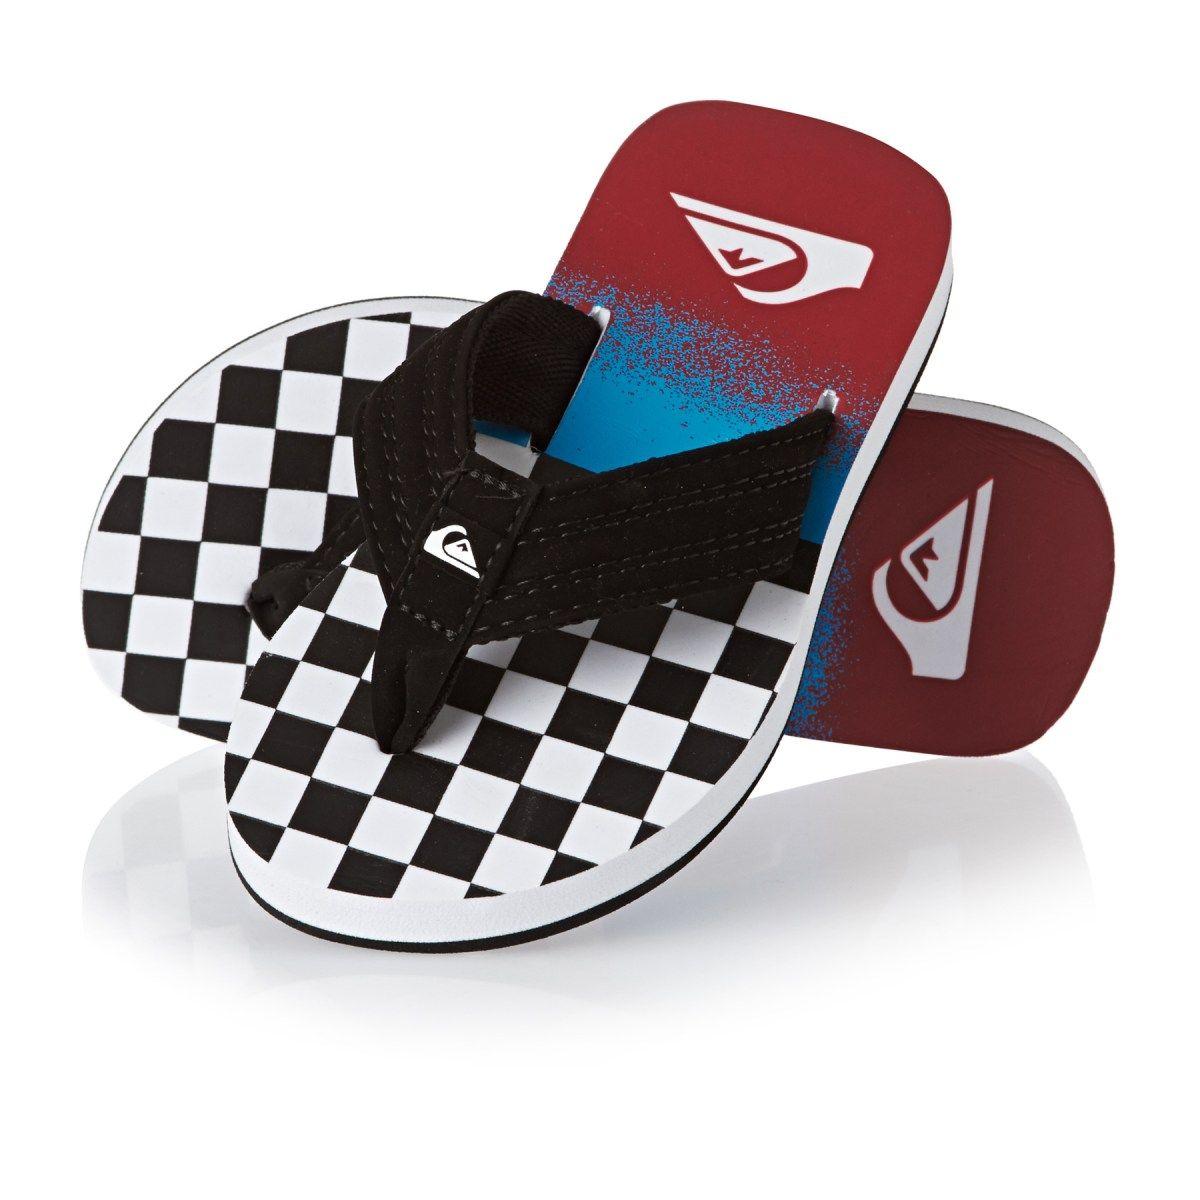 5647ced43045 Quiksilver Flip Flops - Quiksilver Basis Boy Flip Flops - Black Blue ...